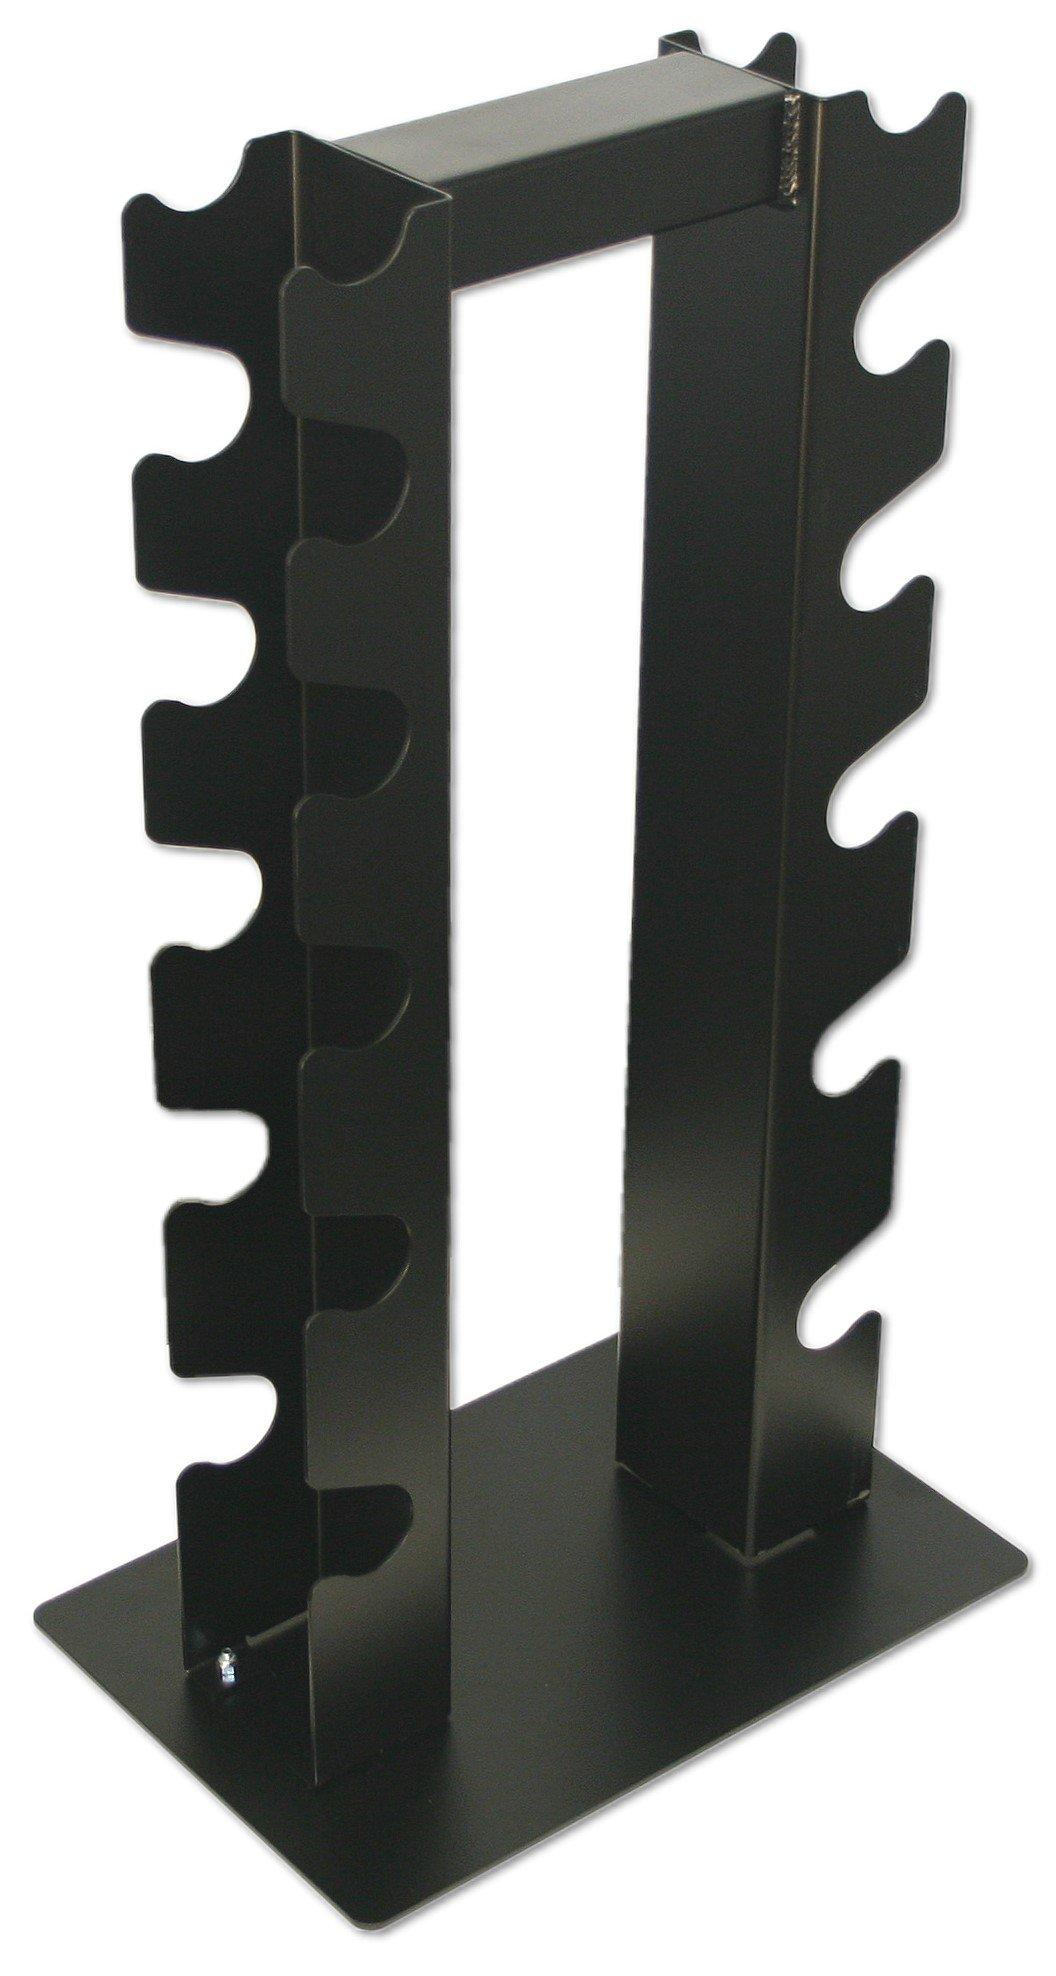 Deltech Fitness 6 Pair Vertical Dumbbell Rack by Deltech Fitness